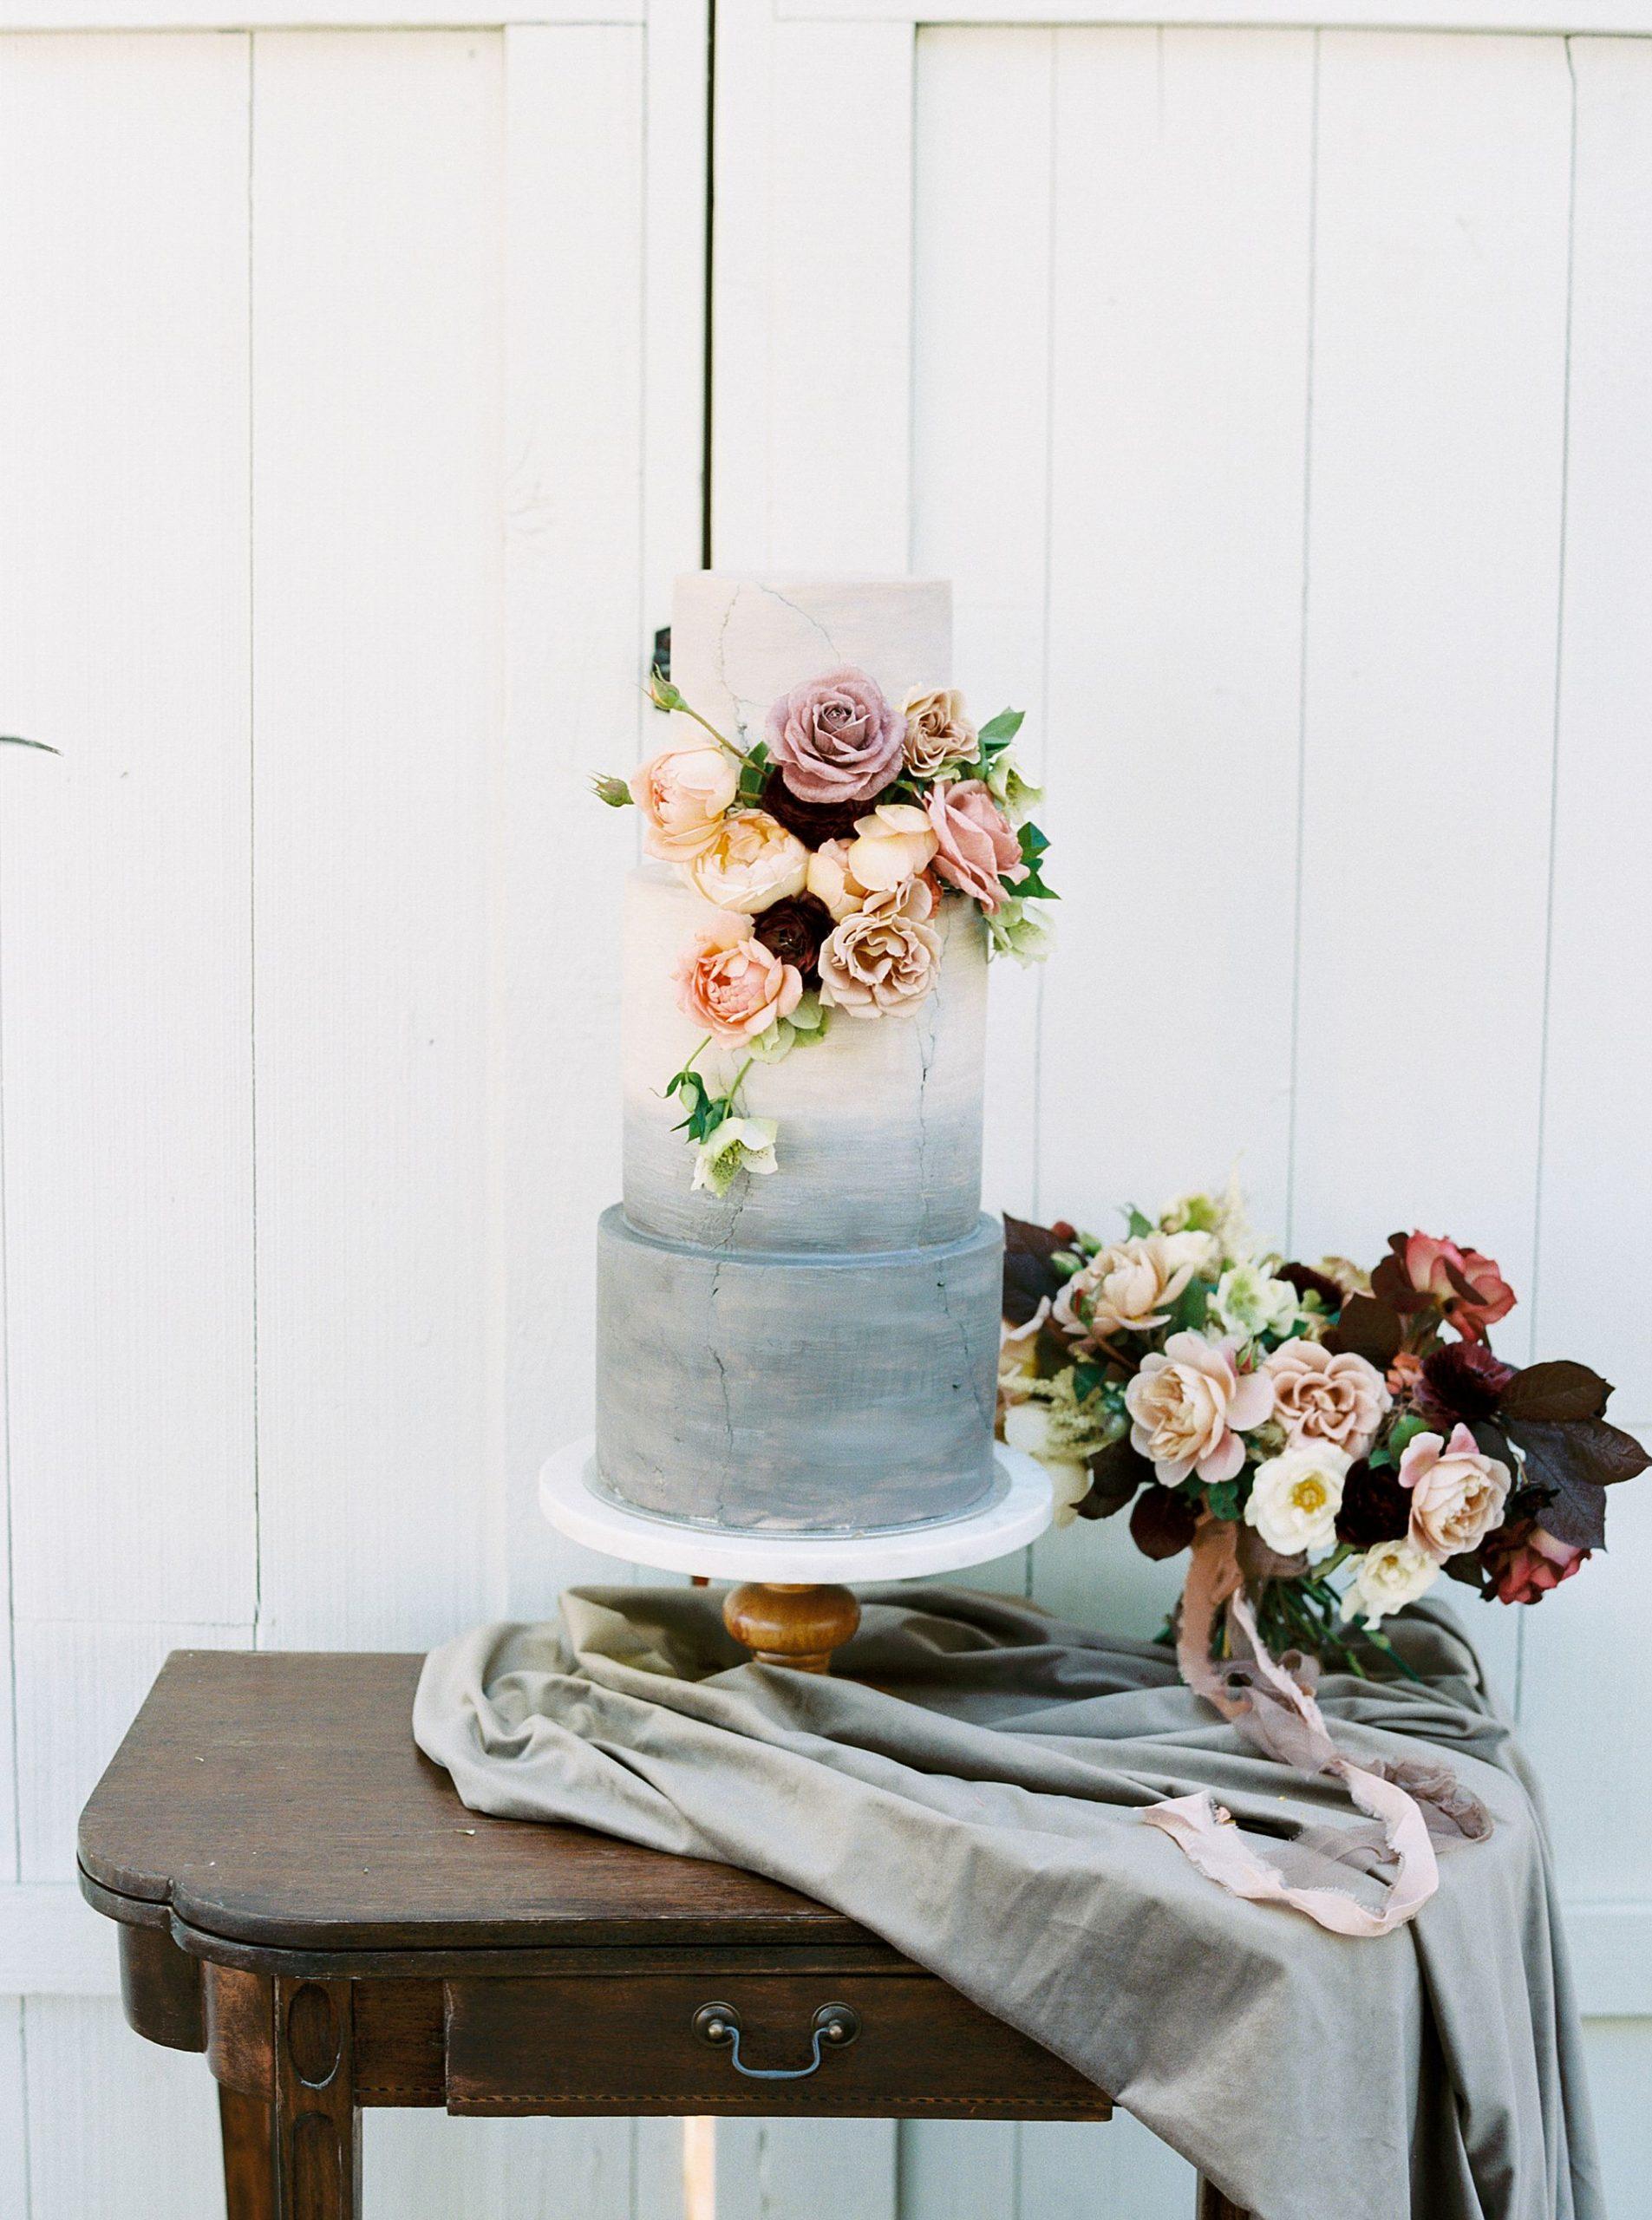 HammerSky Wedding Inspiration Featured on Hey Wedding Lady with Vanessa Noel Events - Ashley Baumgartner - SLO Wedding Photographer_0030.jpg